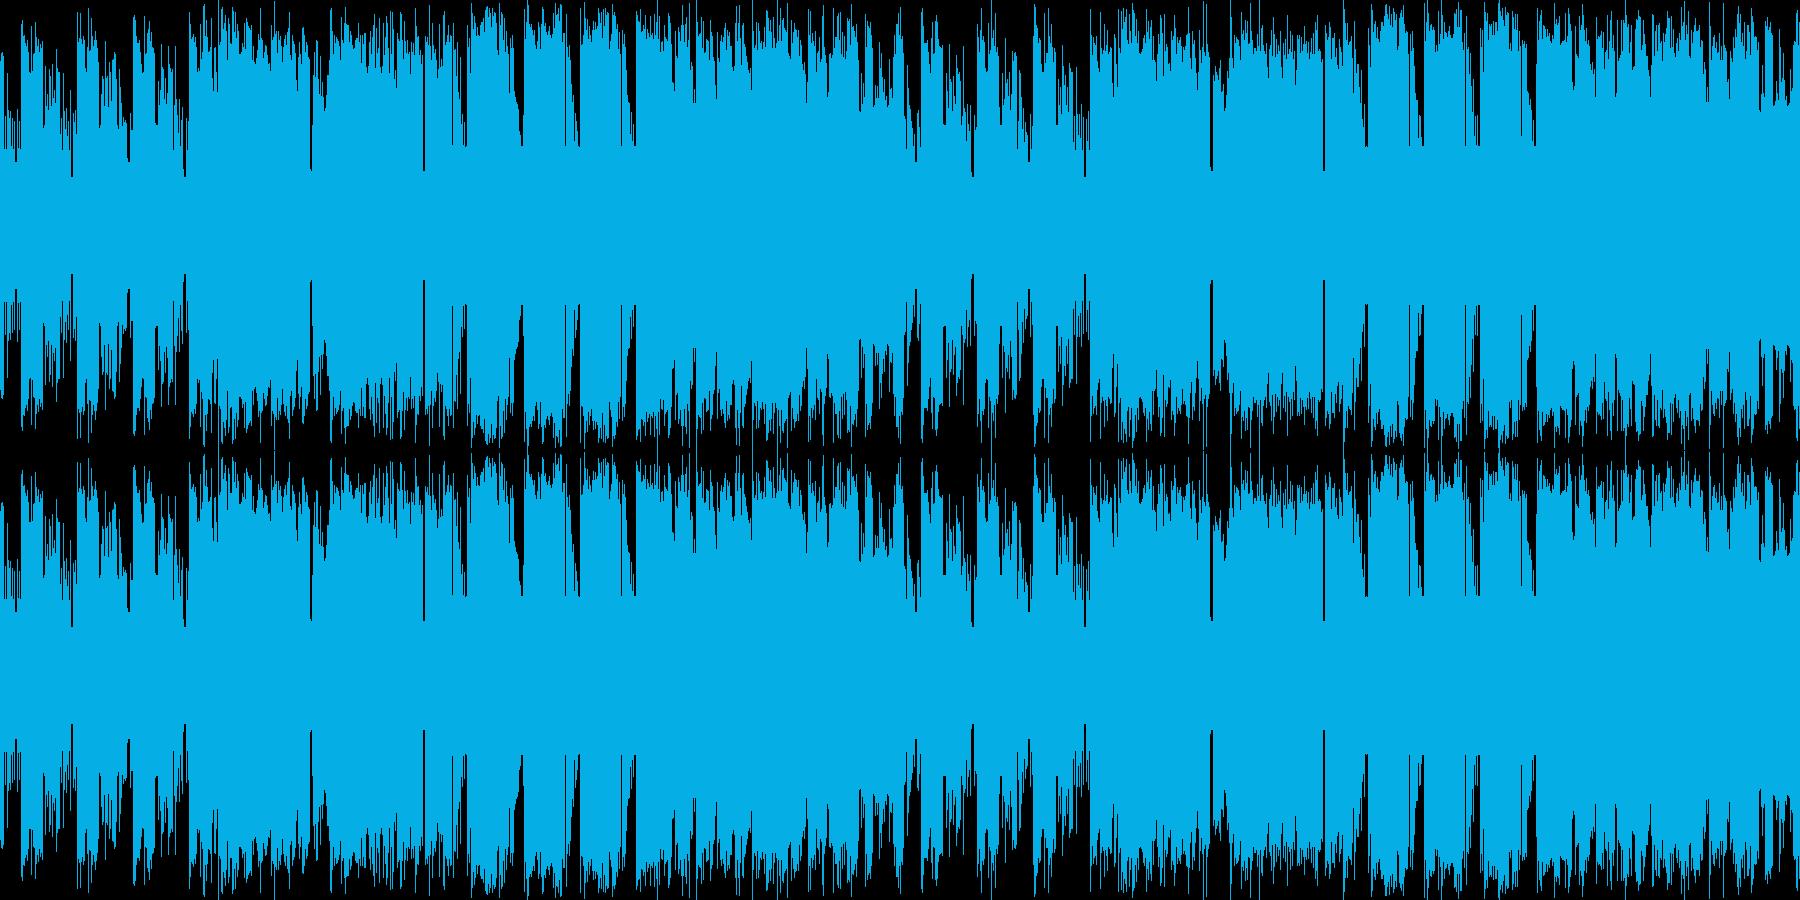 8bitチップチューン:アクション#02の再生済みの波形